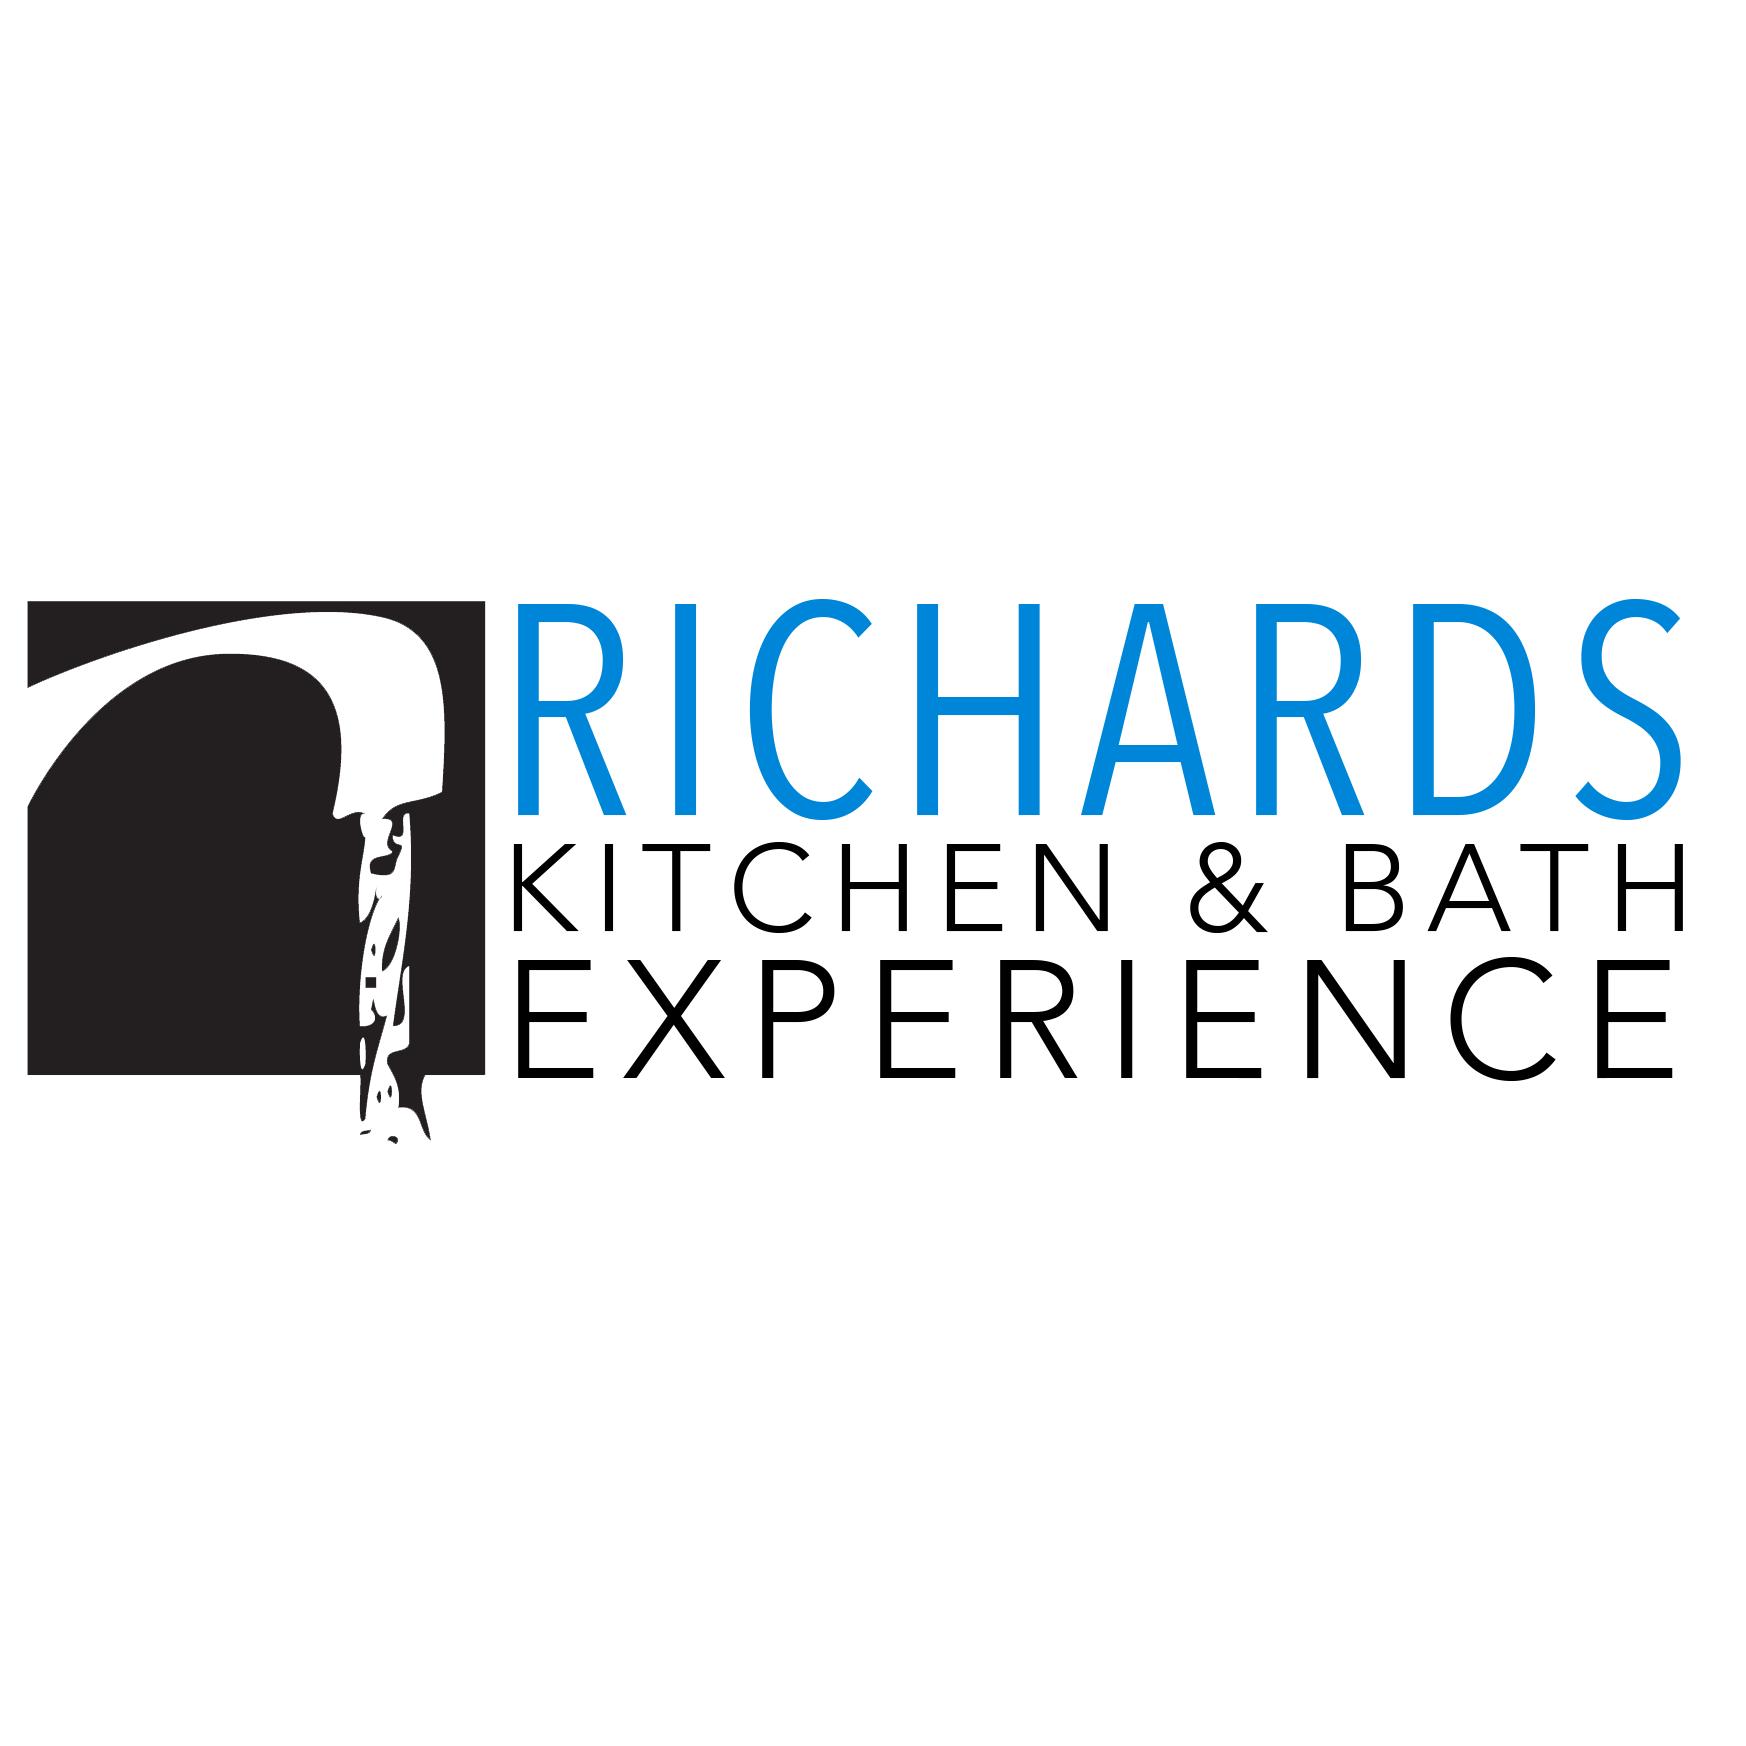 Richards Kitchen & Bath Experience - Wyoming, MI 49548 - (616)828-0177 | ShowMeLocal.com